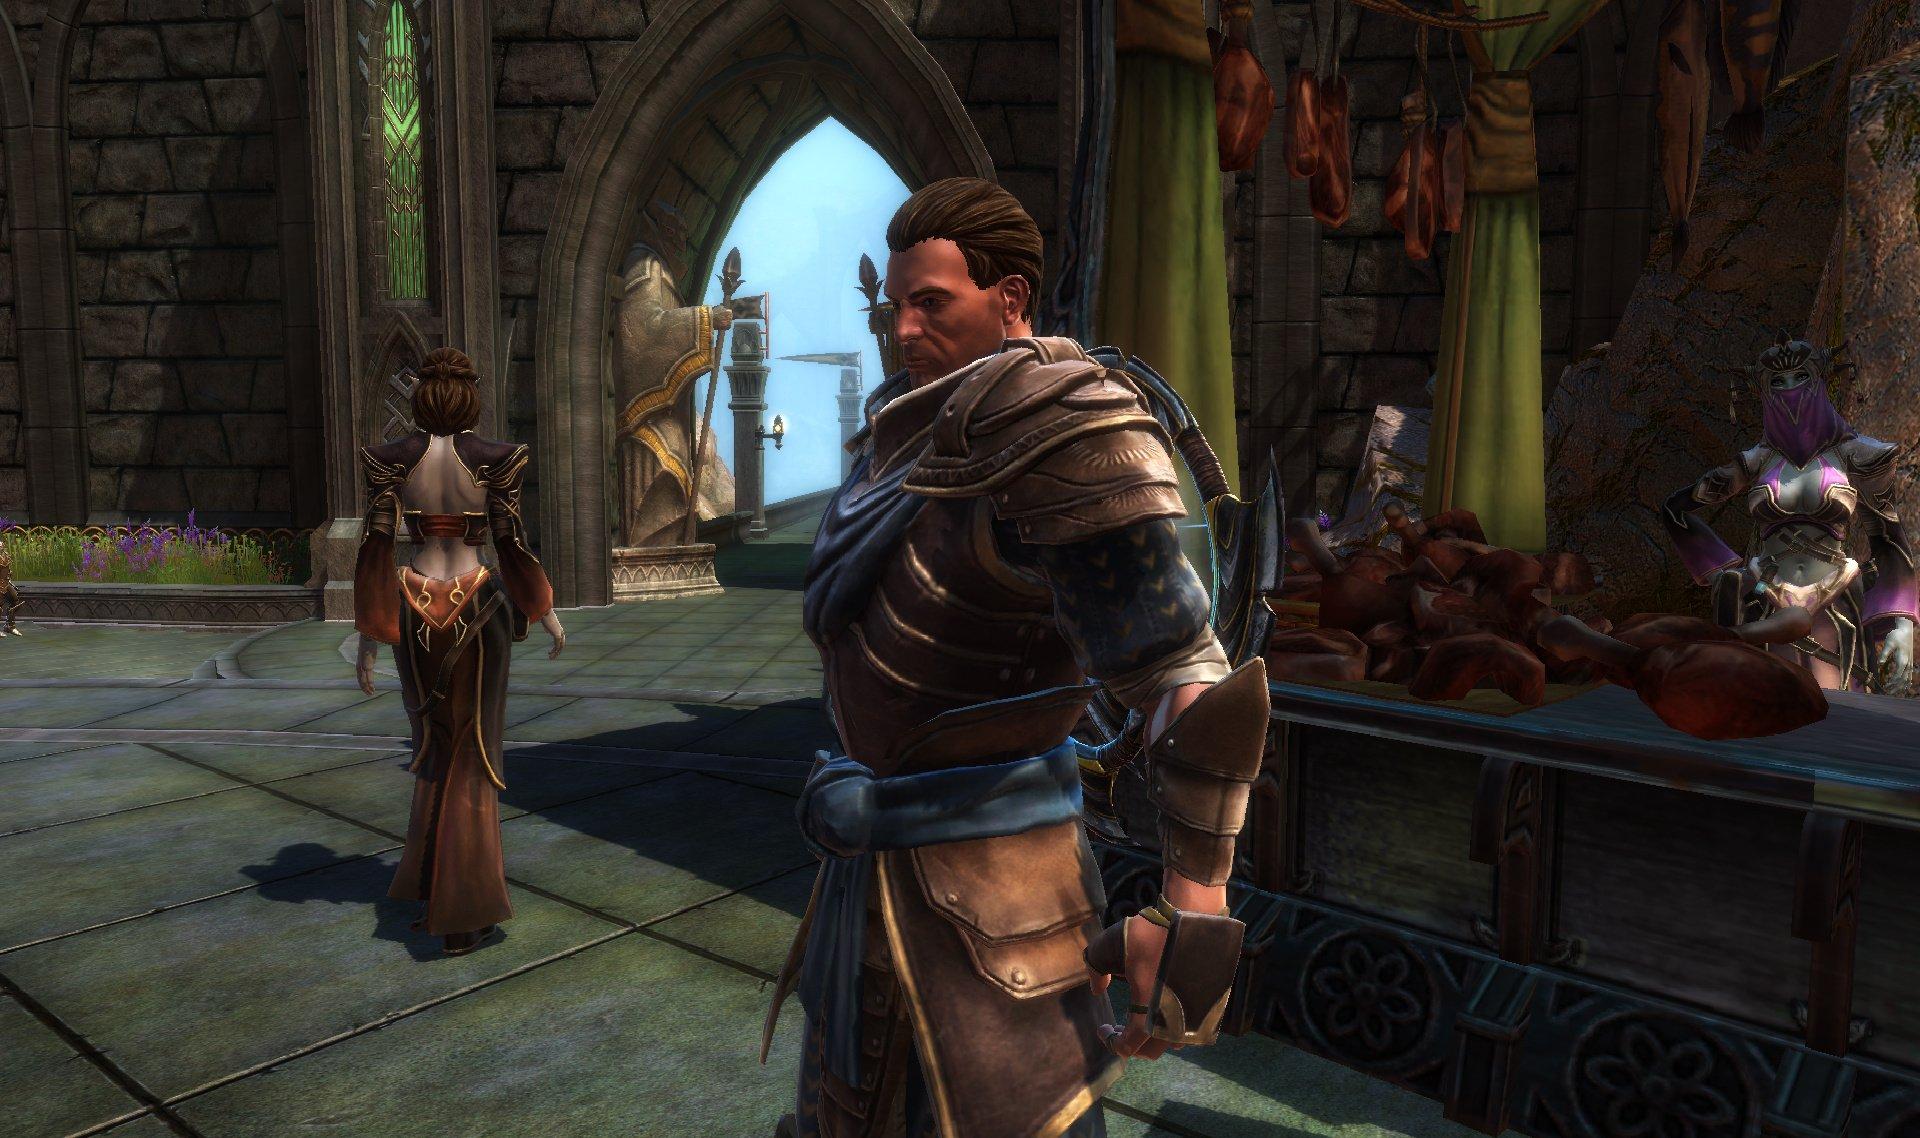 Dreadscale/Prismere Armor Kingdoms of Amalur: Reckoning